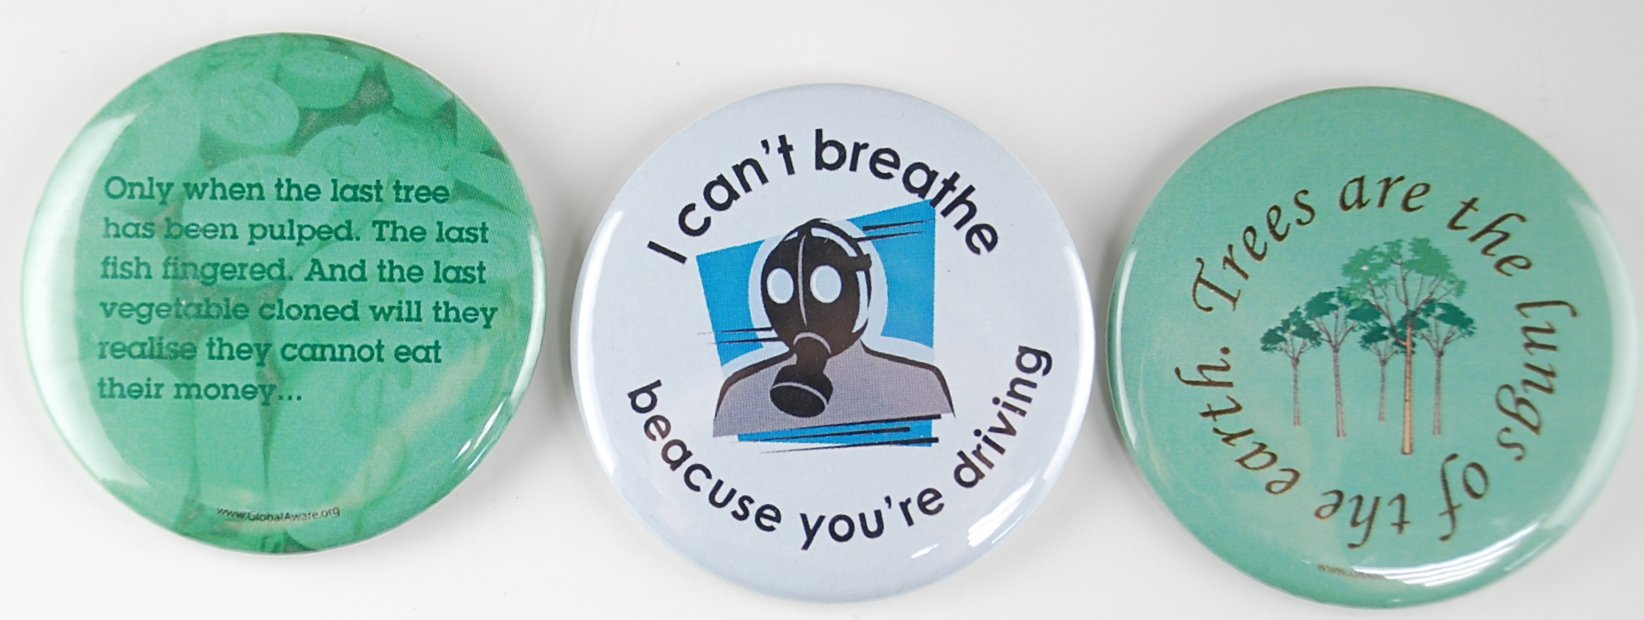 pin-back button, pinback button, environmental pin, earth day pin